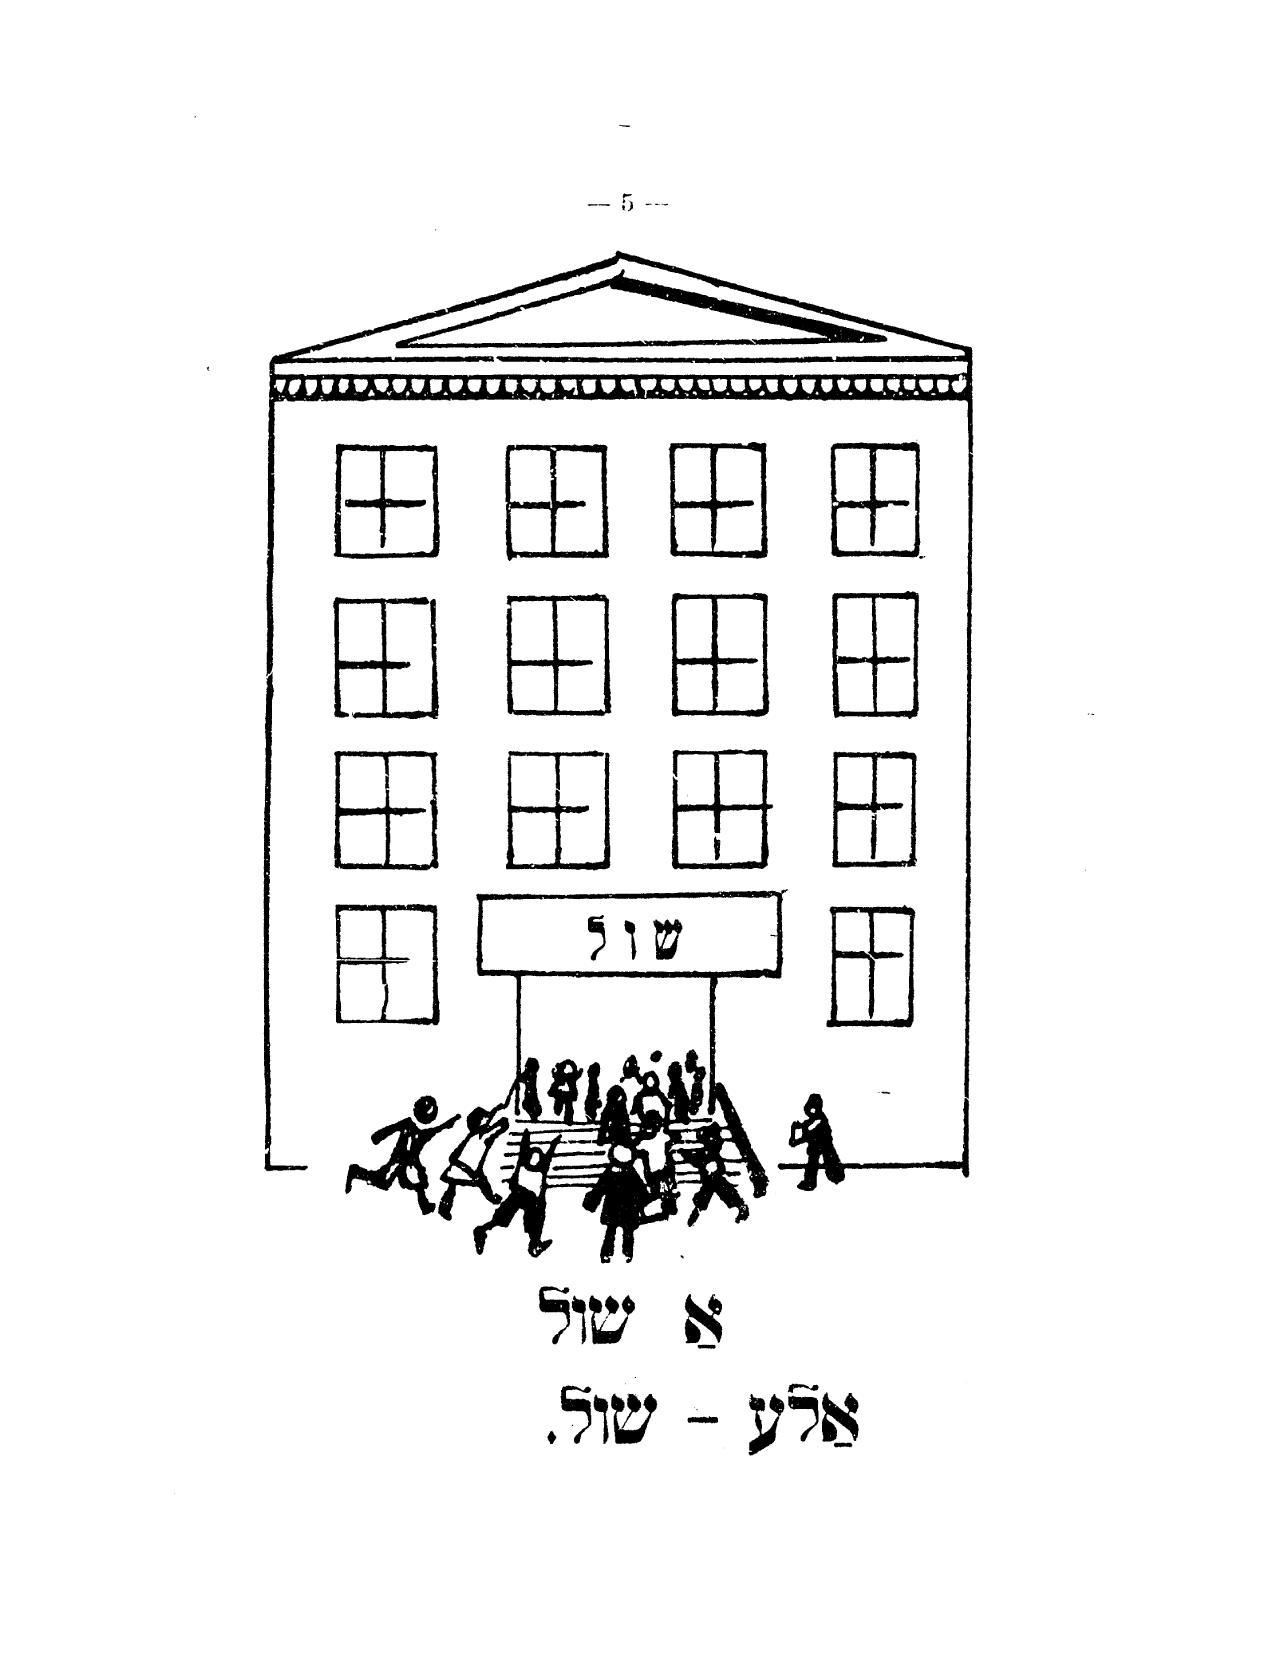 <p>Page from a 1931 Yiddish primer (<em>Kinder: onfanger lernbukh far ershtn yor</em><em>, </em>Deborah Tarant and Bezalel&nbsp;Friedman),</p>